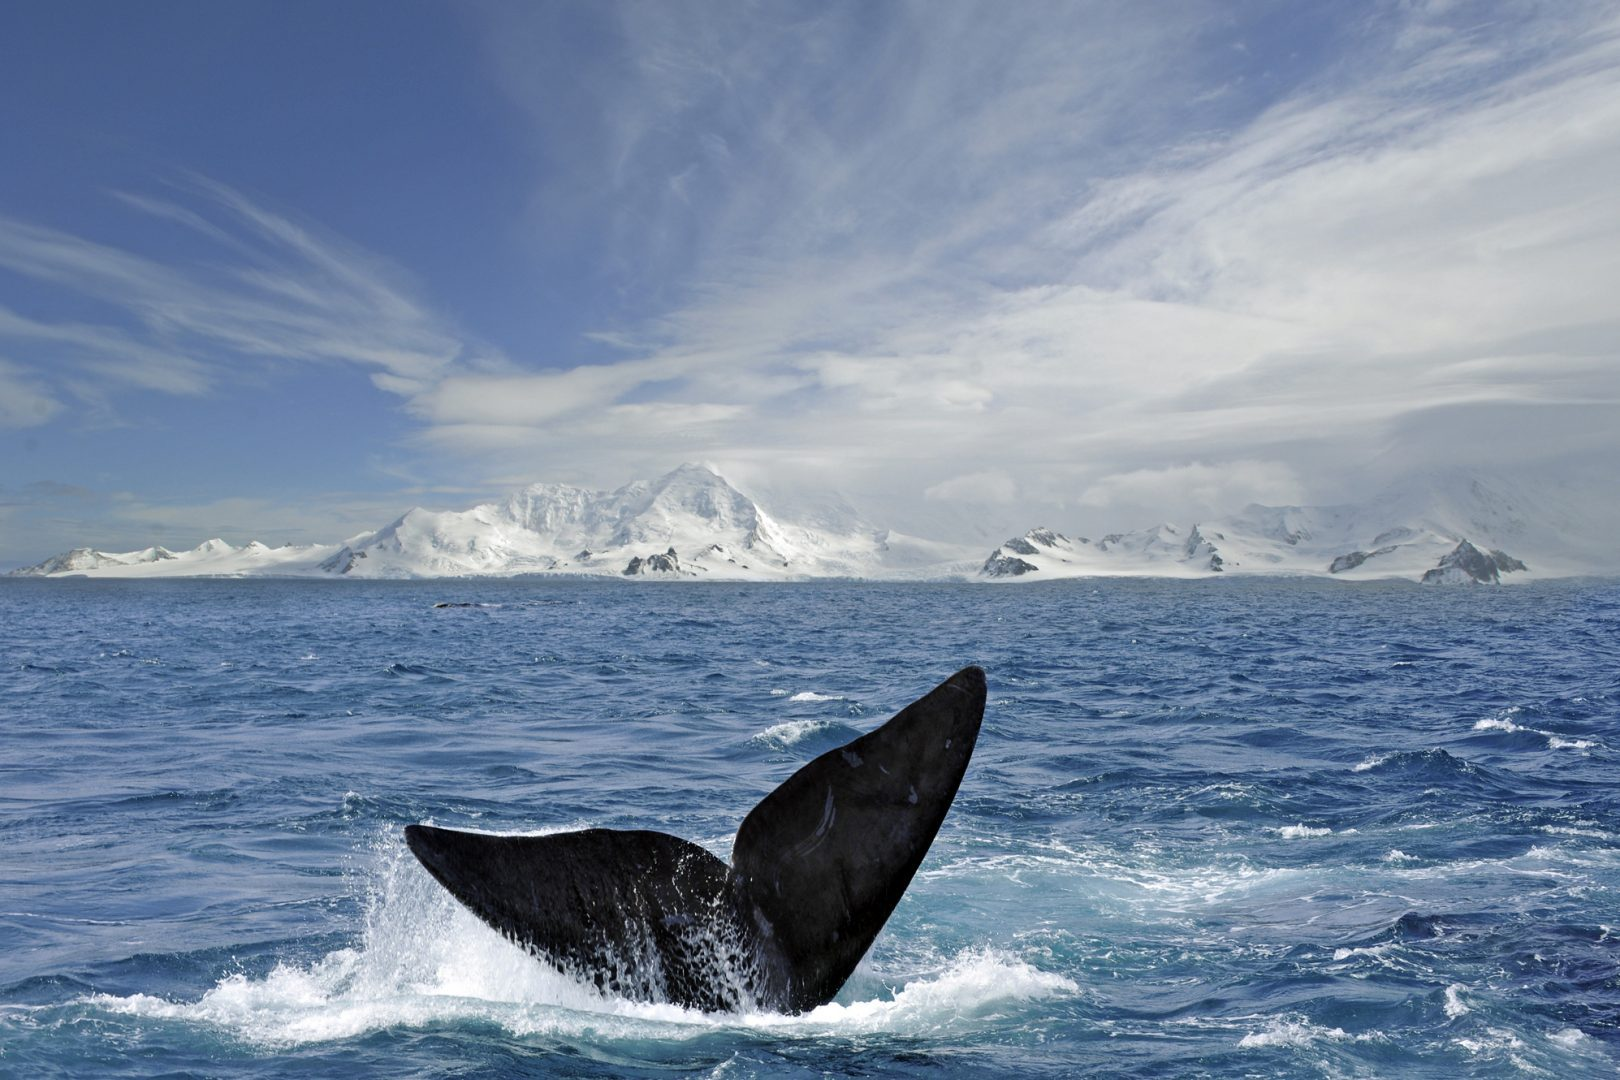 PhotoFly Travel Club | whale ant | PhotoFly Travel Club